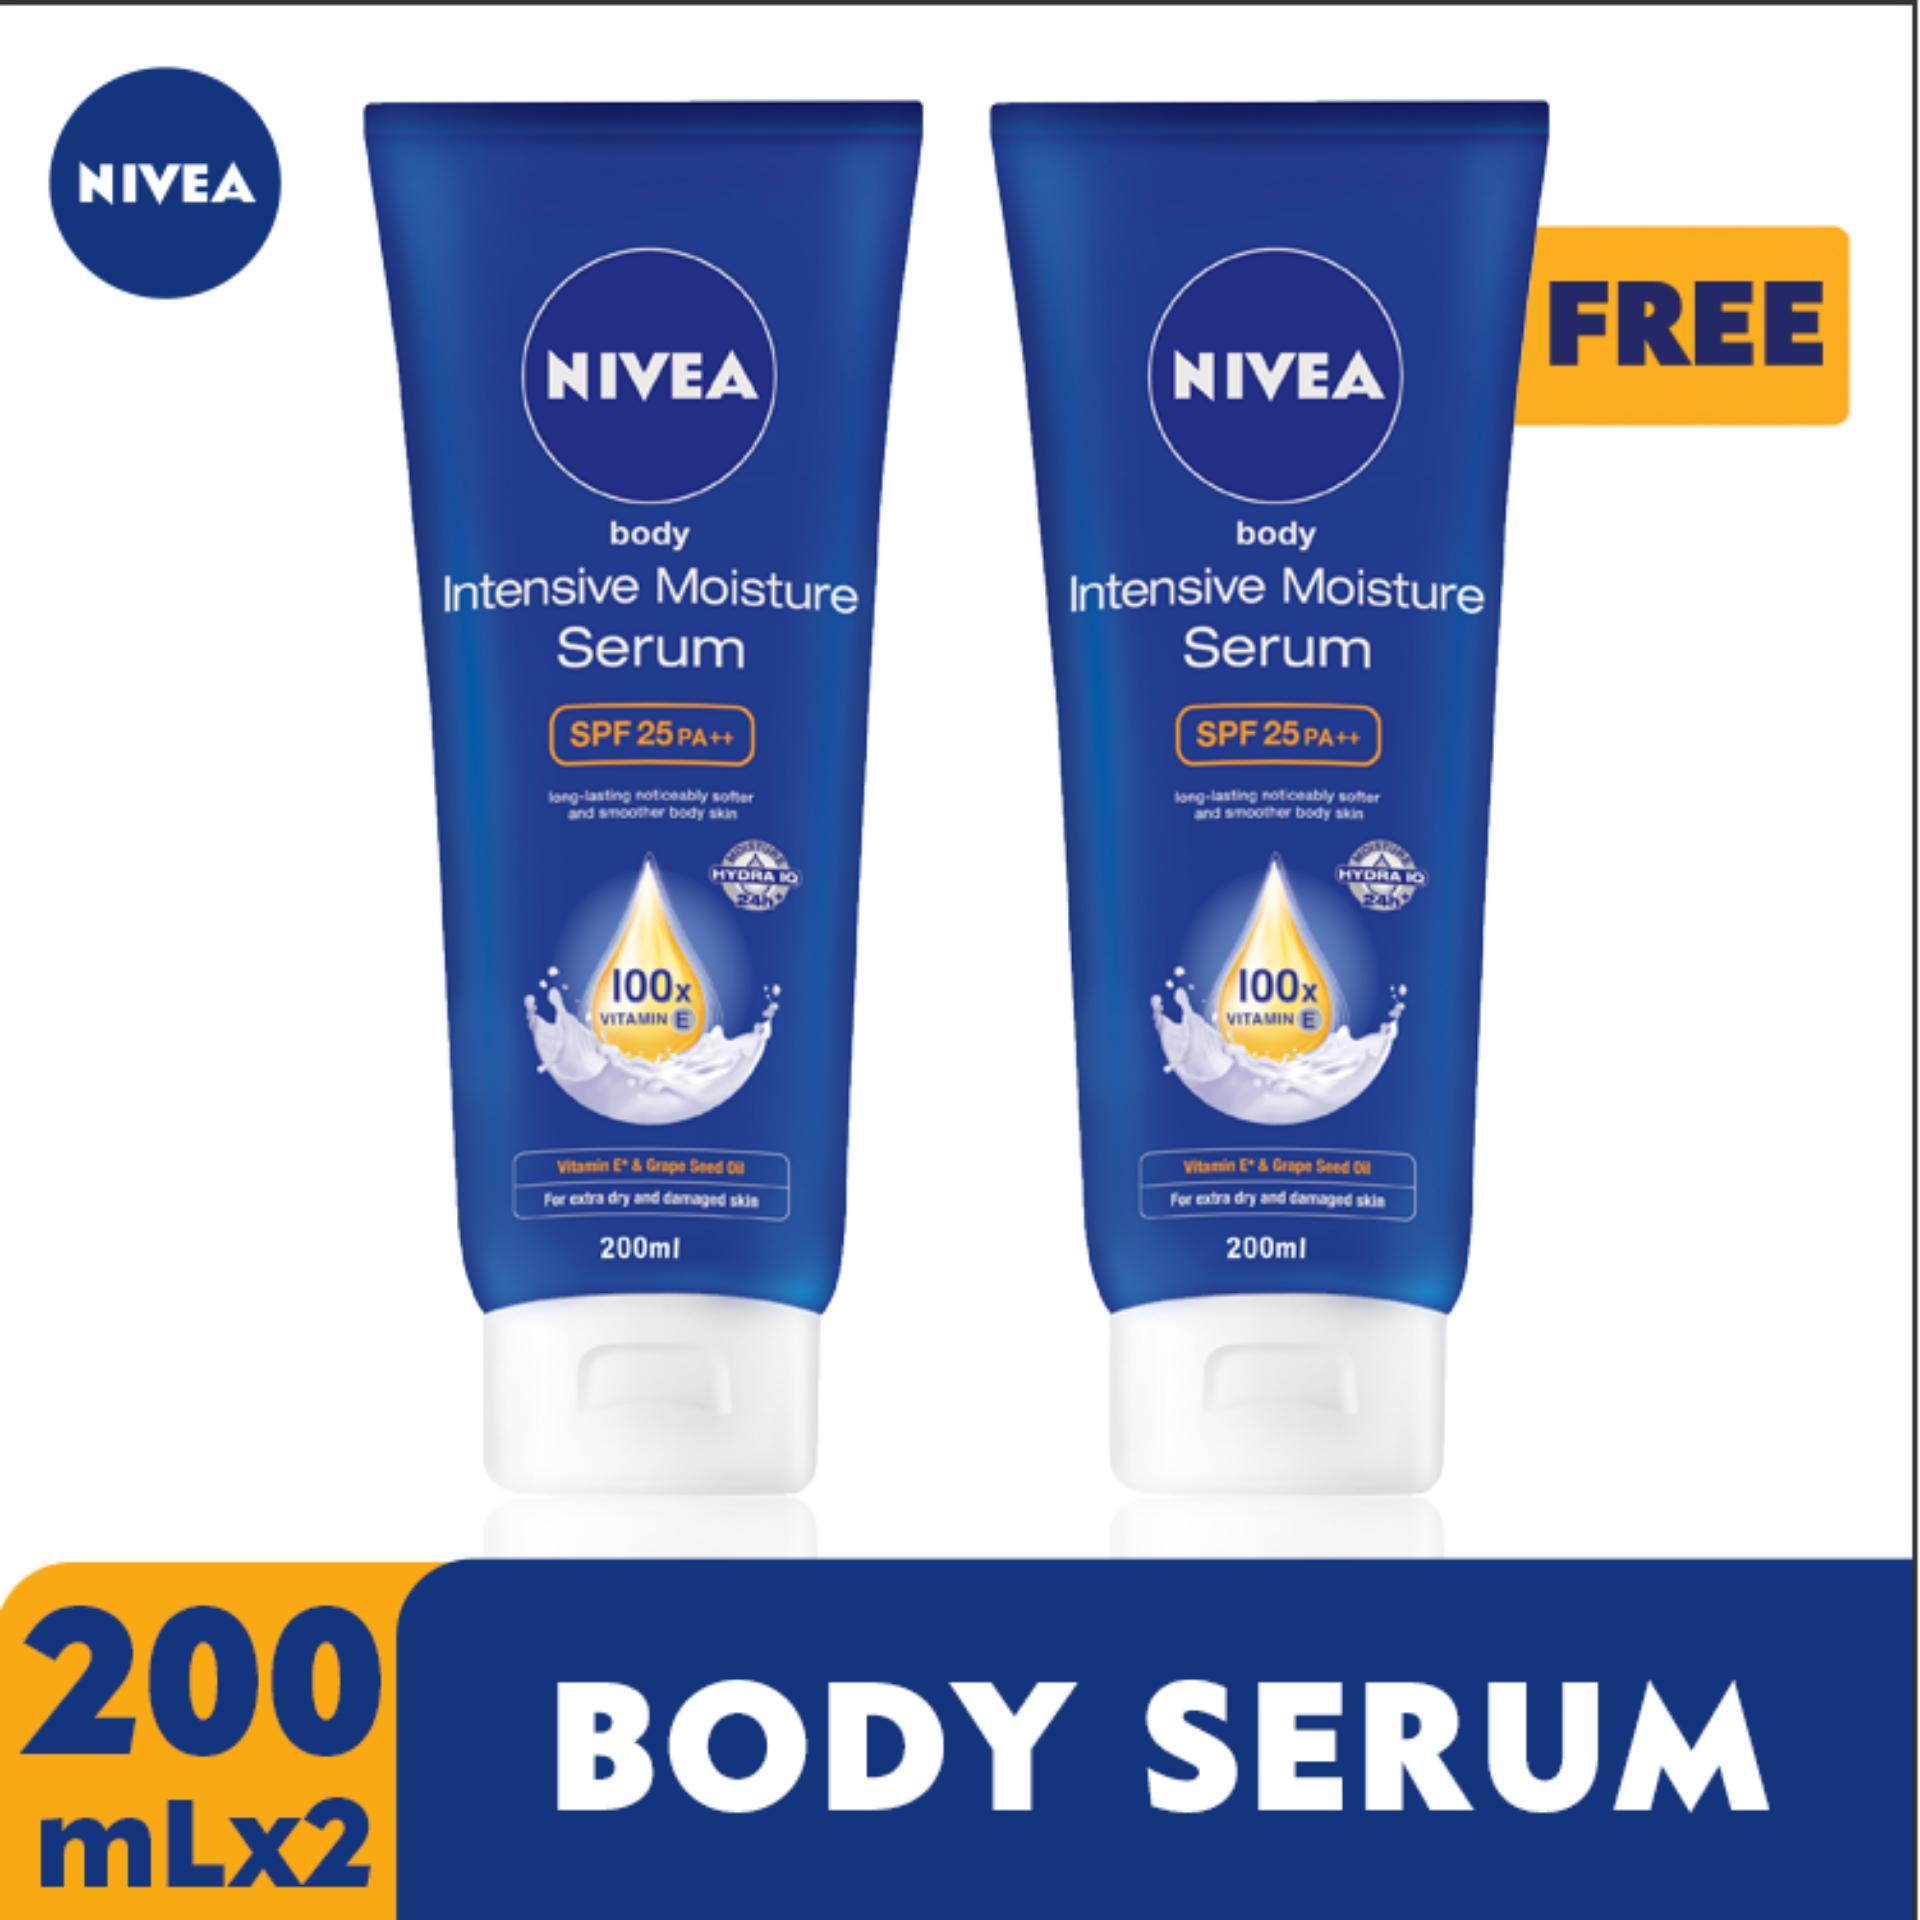 Nivea Philippines Price List Lotion Deodorant Baby Make Up Clear 2 In 1 White Foam 100ml Buy Take Body Intensive Moisture Bodyserum 200ml